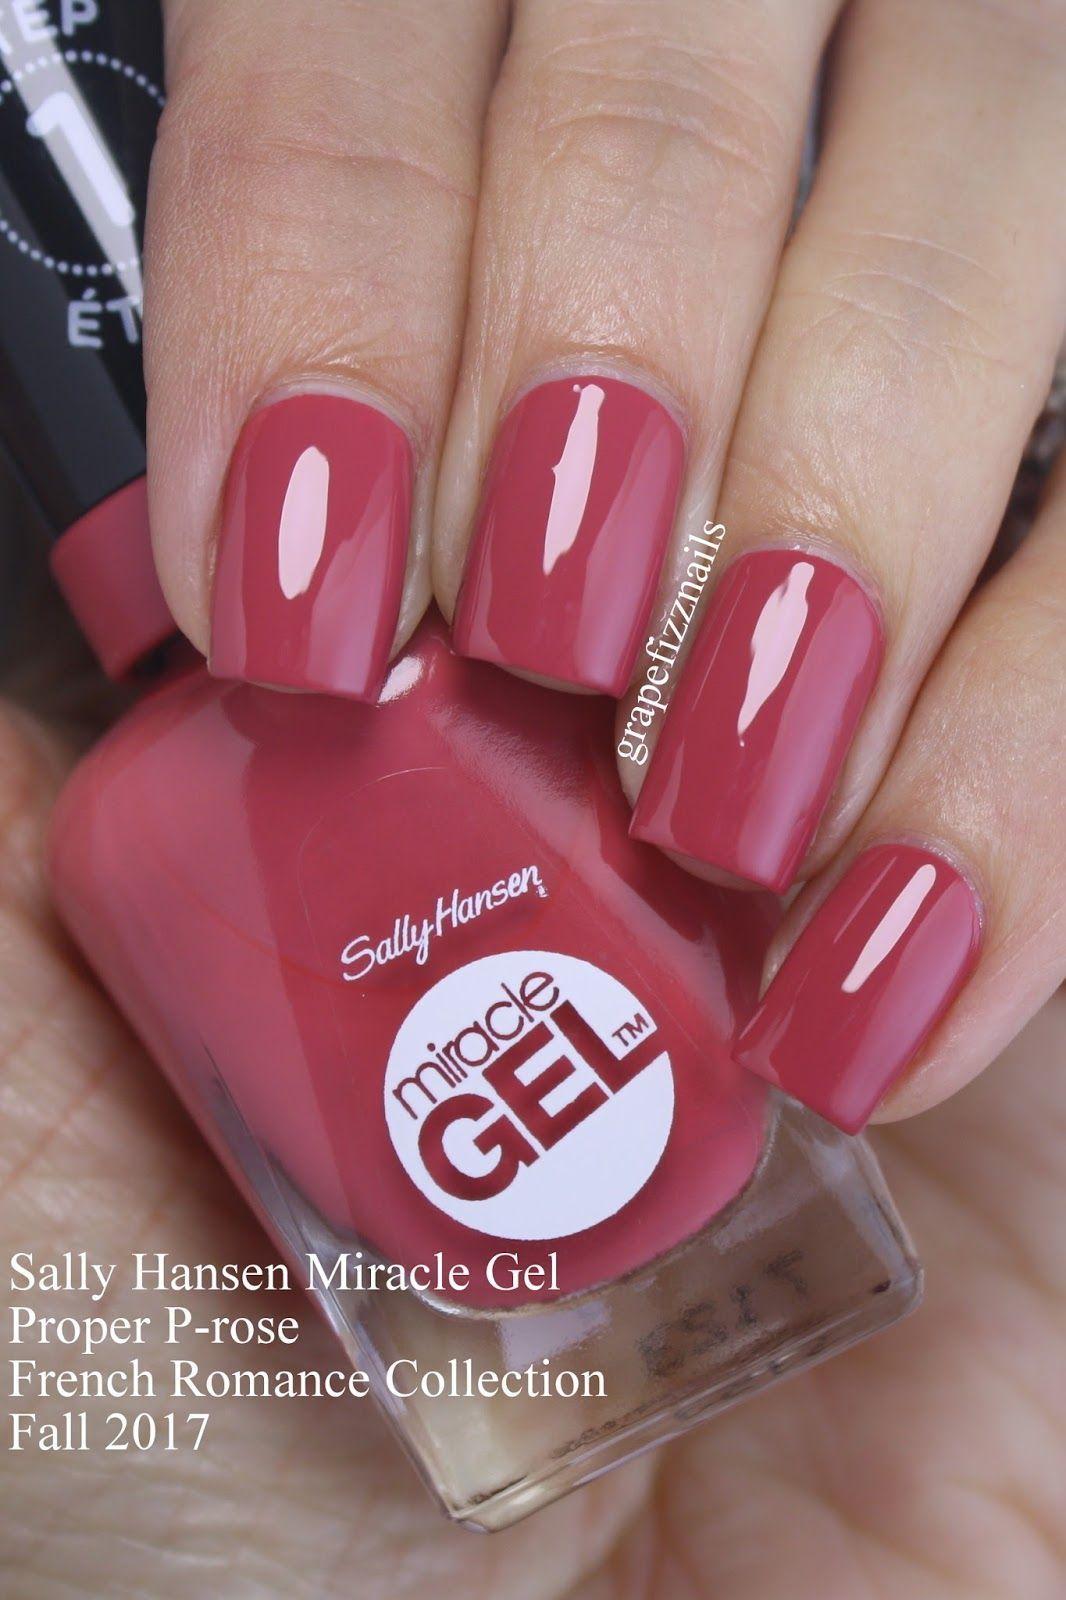 Drugstore Nail Polishes Celebrities Love To Wear On The Red Carpet Drugstore Nail Polish Mauve Nails Nail Polish